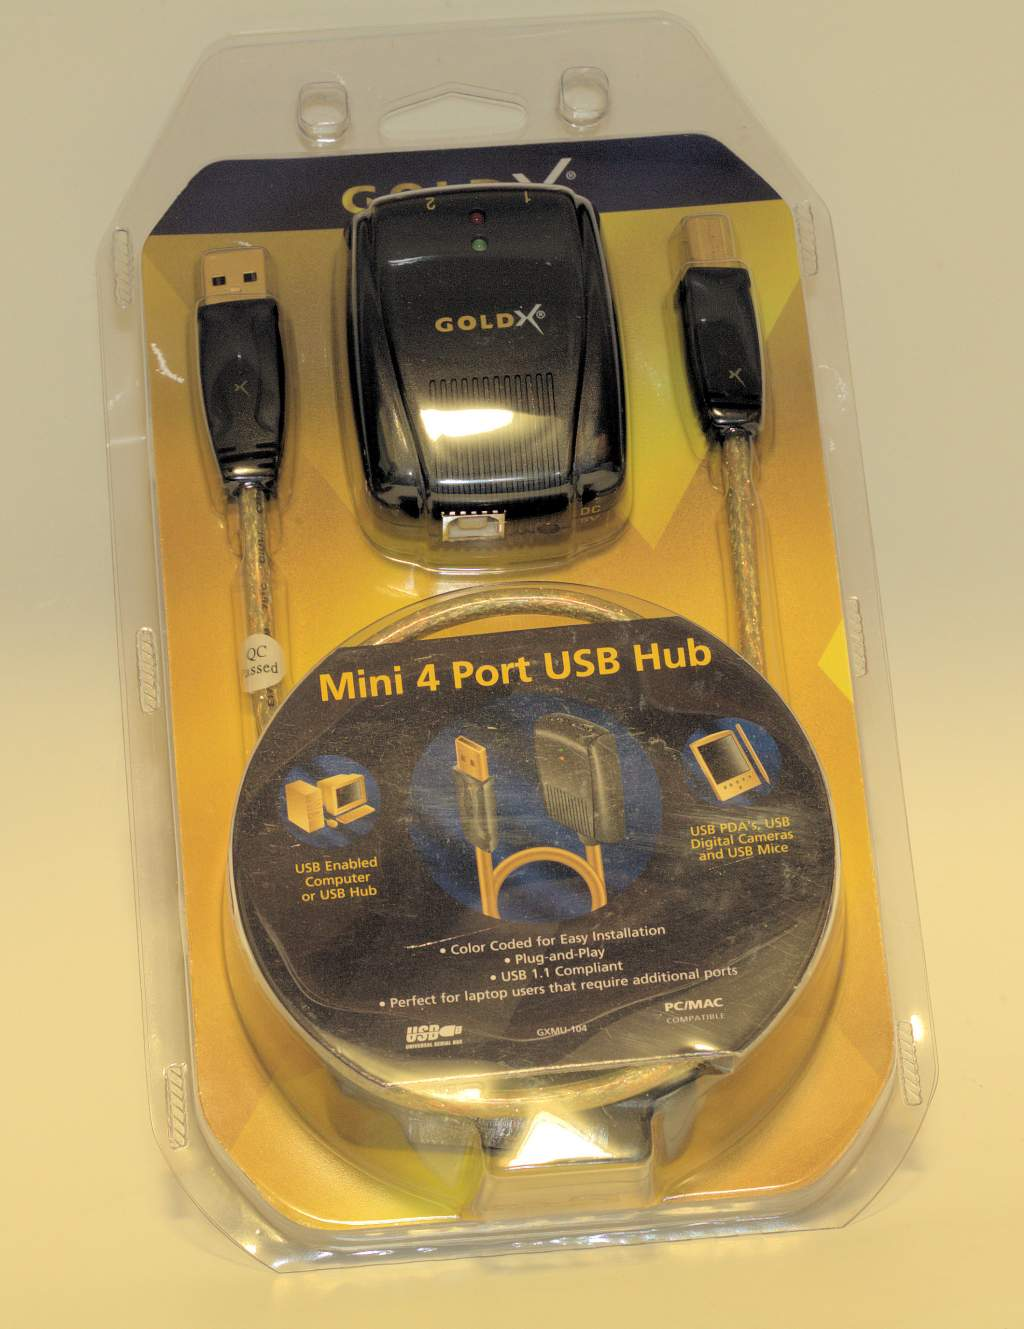 USB 1.1 4-PORT PowerED HUB